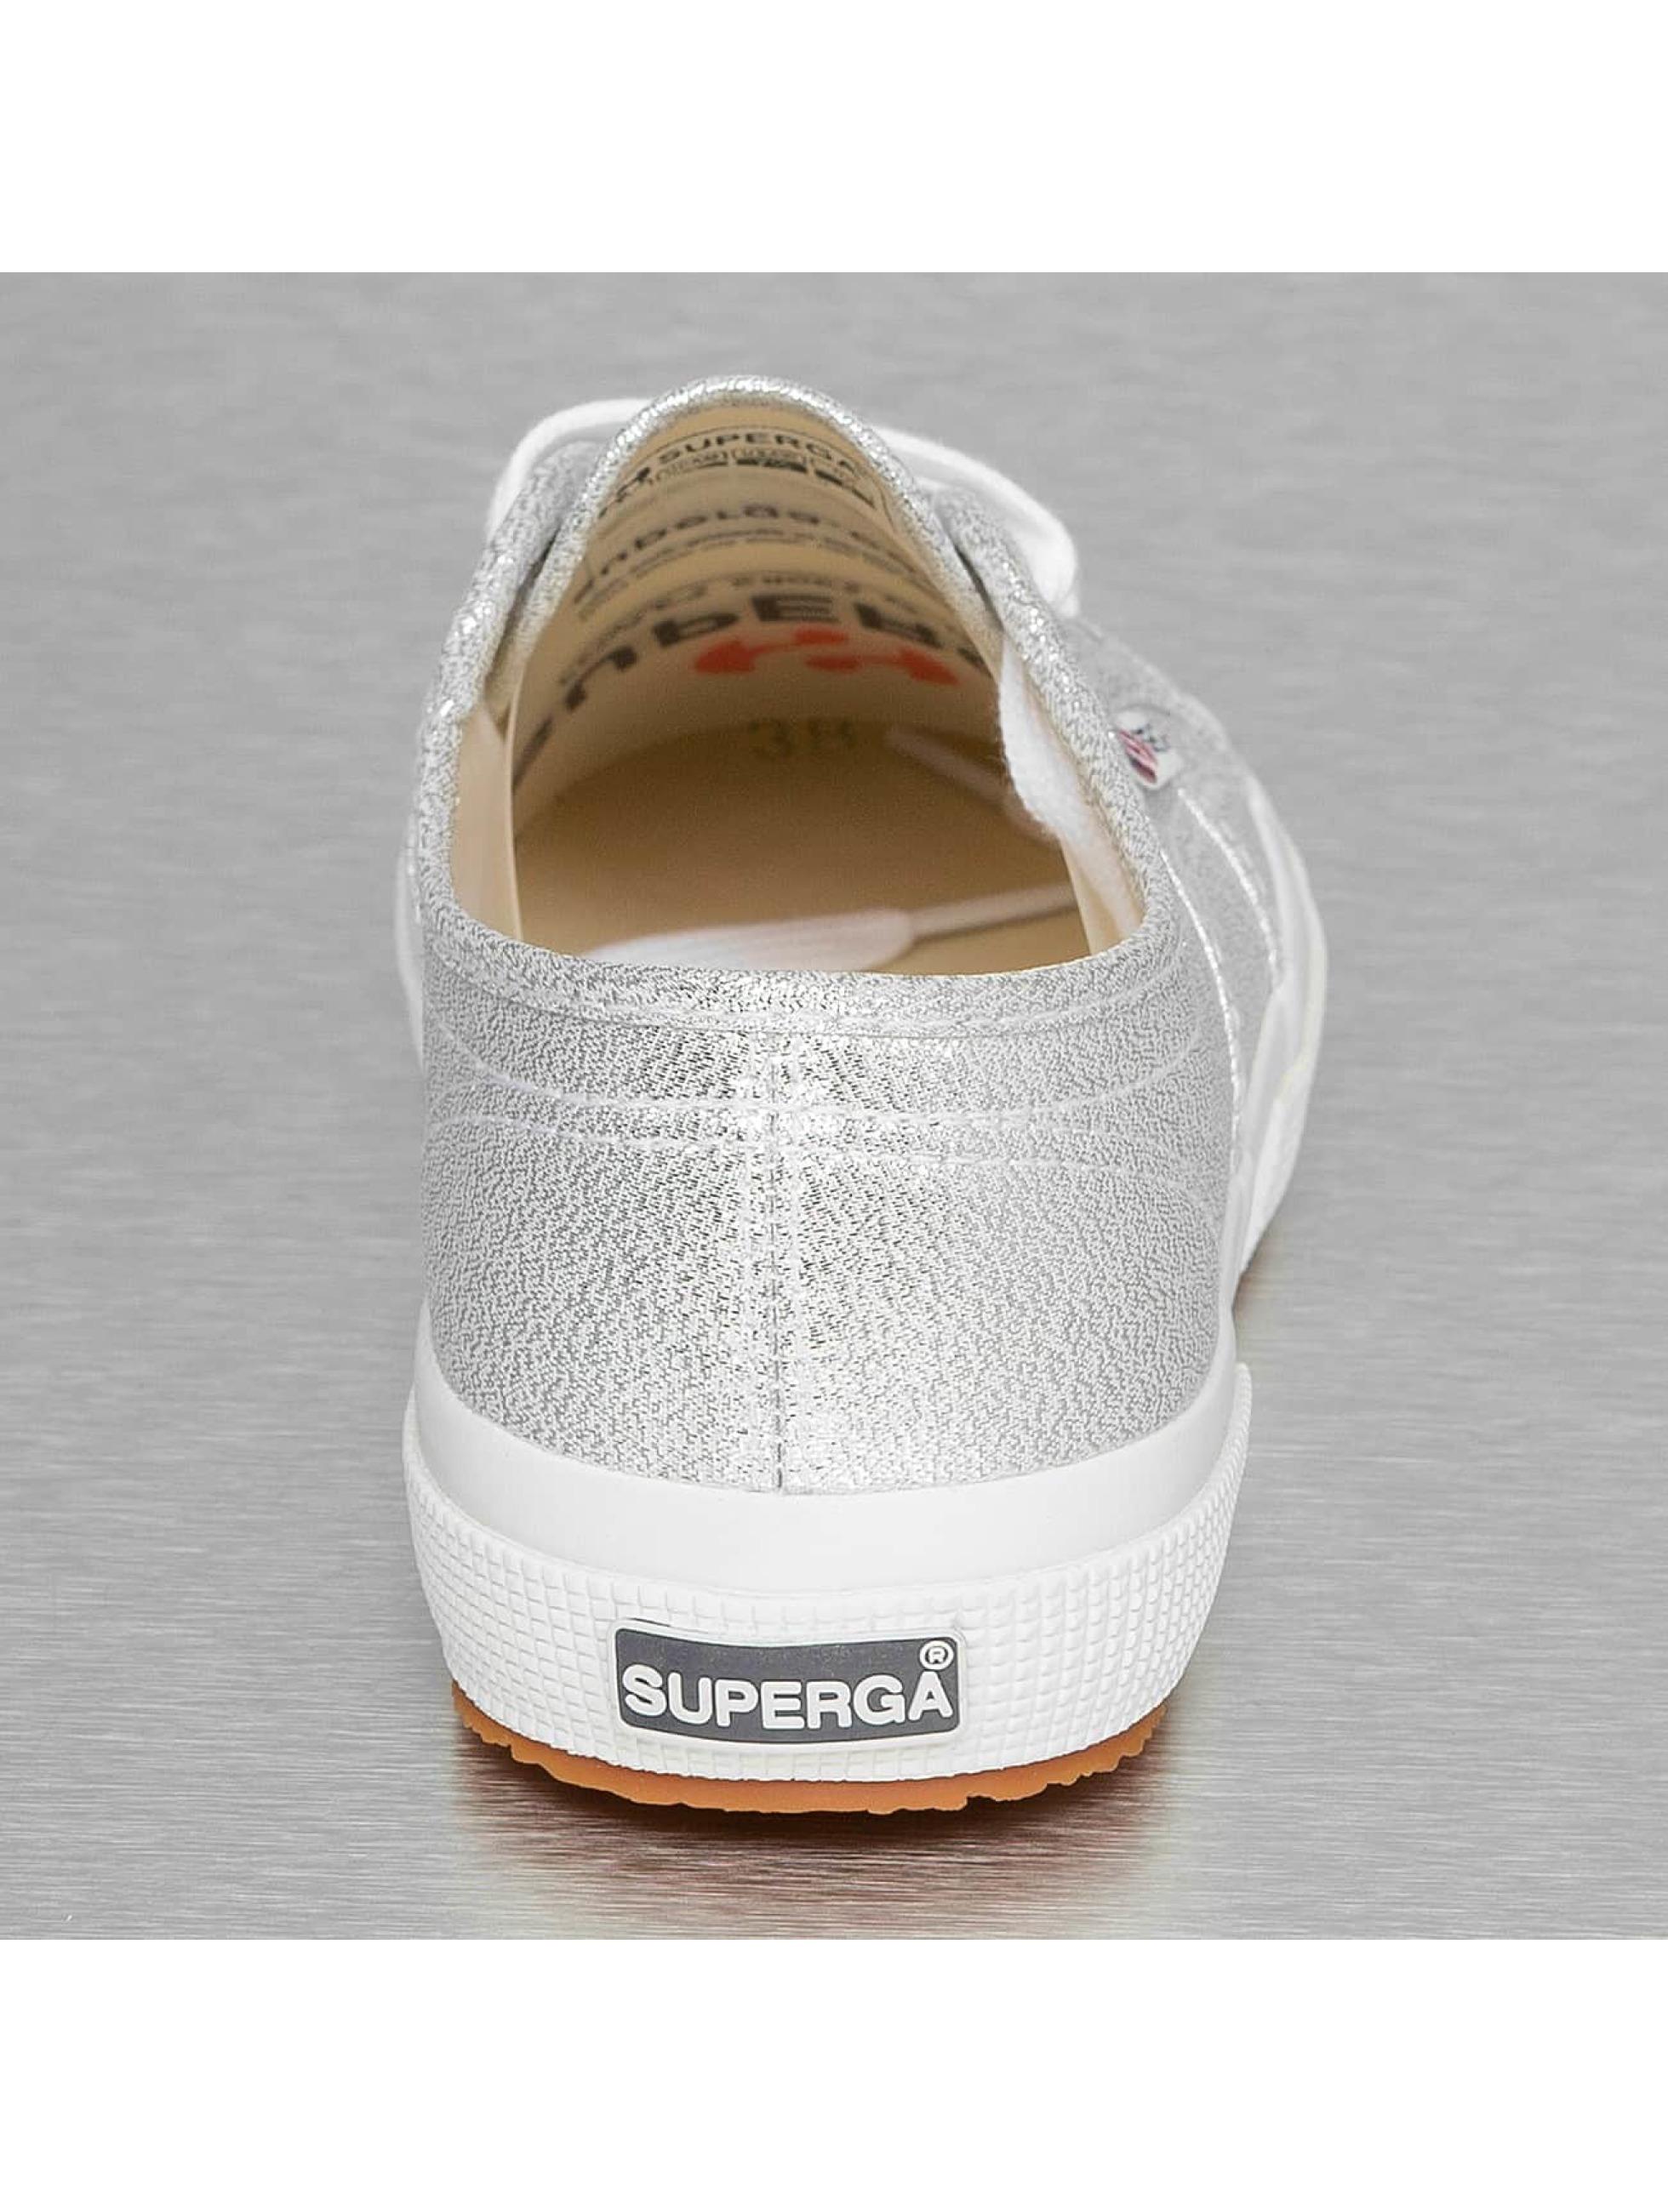 Superga Sneakers 2750 Lamew gümüş